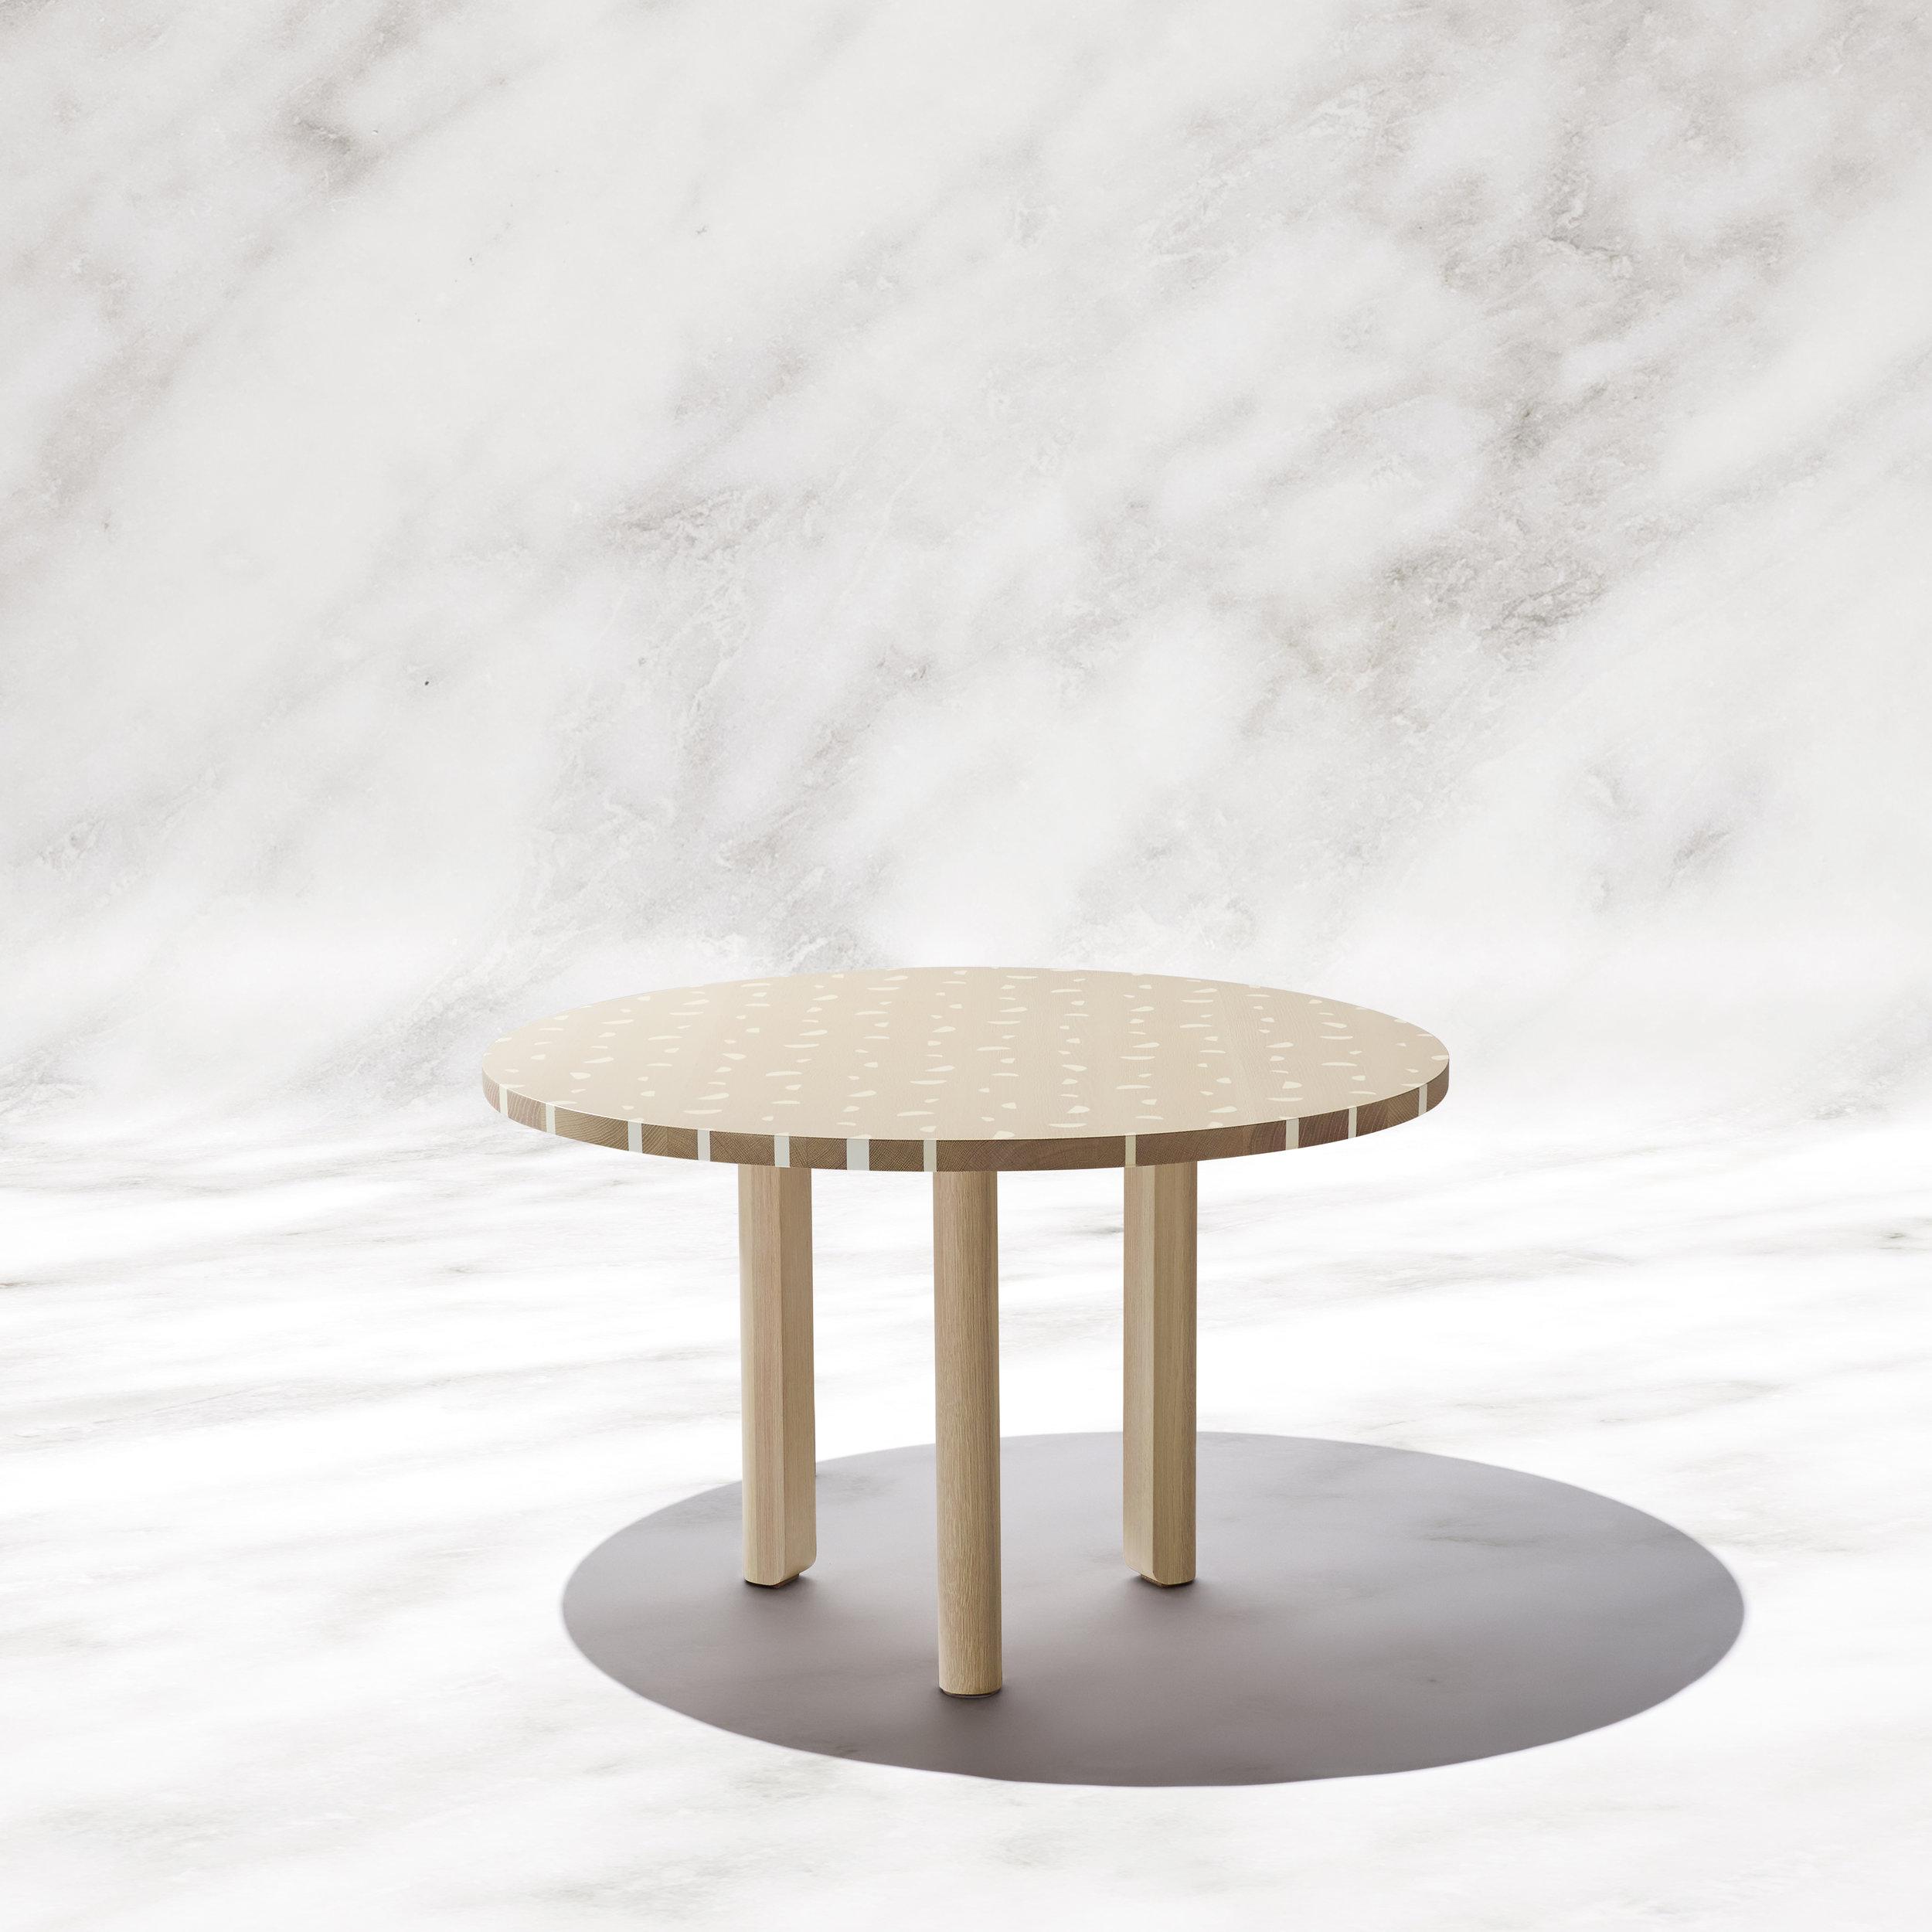 Furniture_FINAL3.jpg